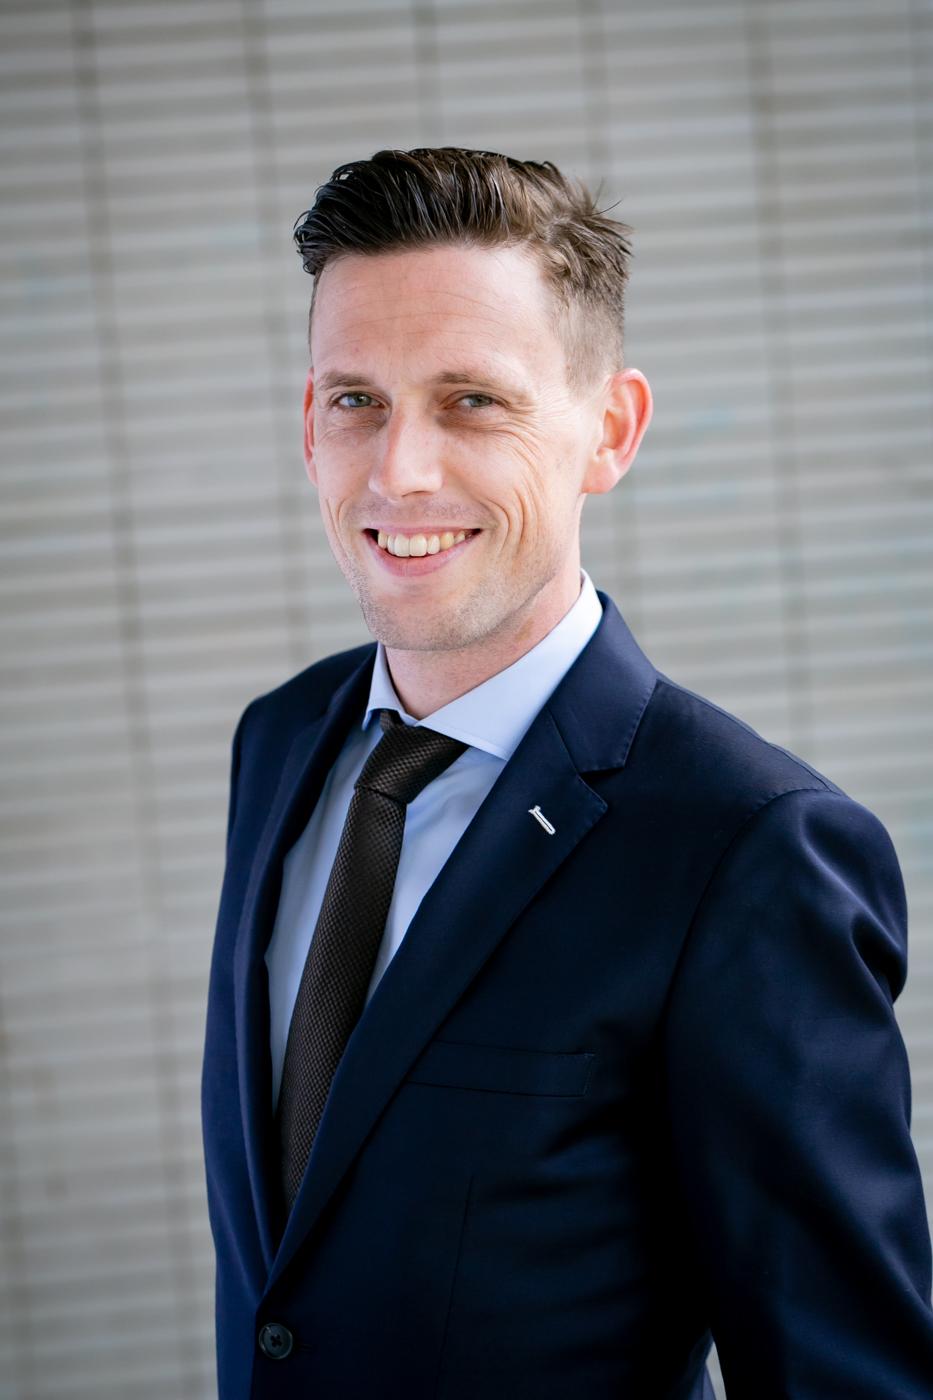 Steven Diepenhorst - VAT fiscal representative